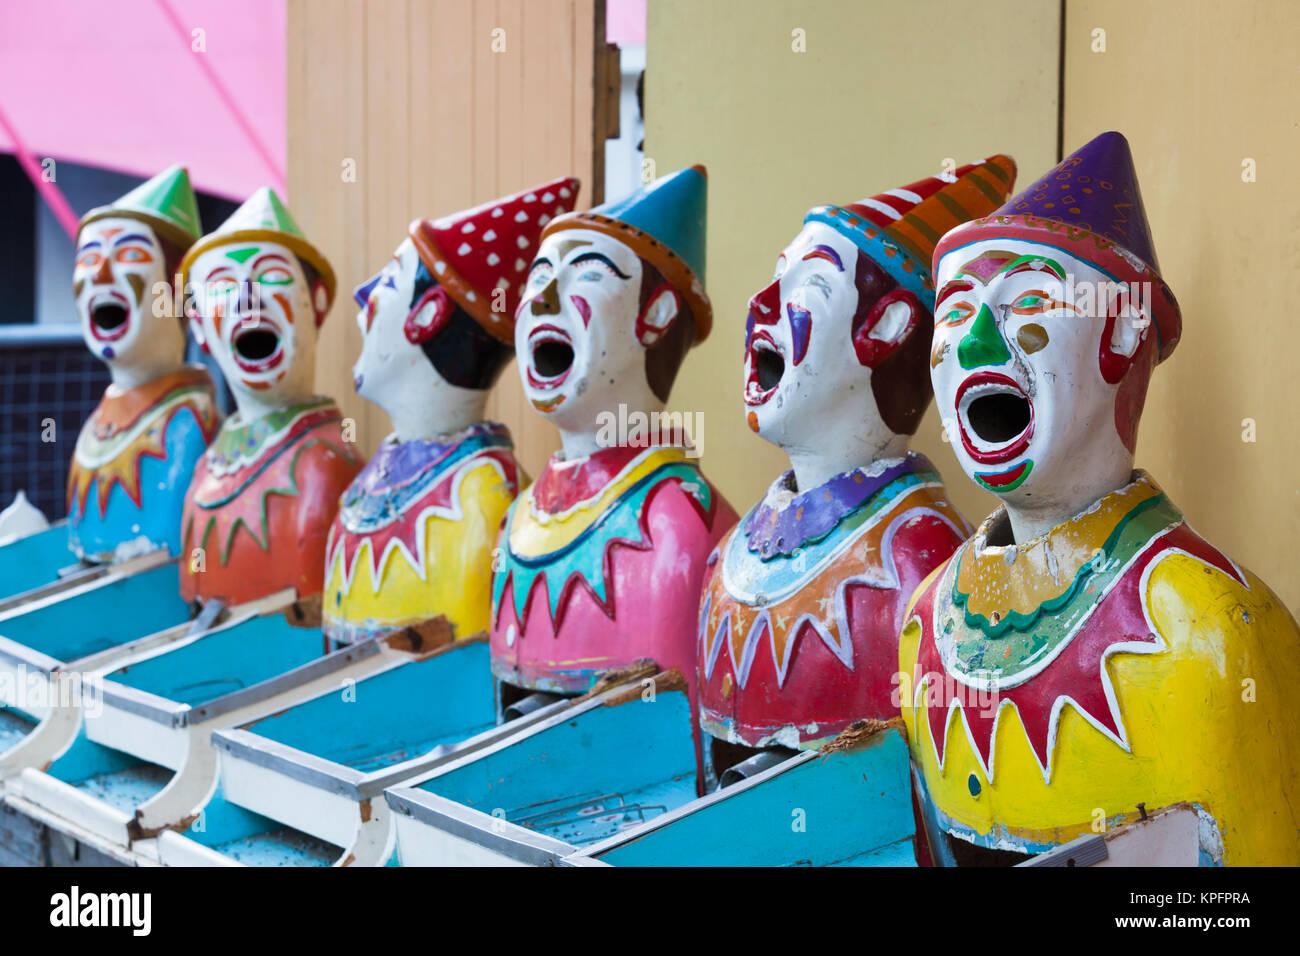 Australia, Adelaide, Rundle Park, clown heads at water gun arcade - Stock Image